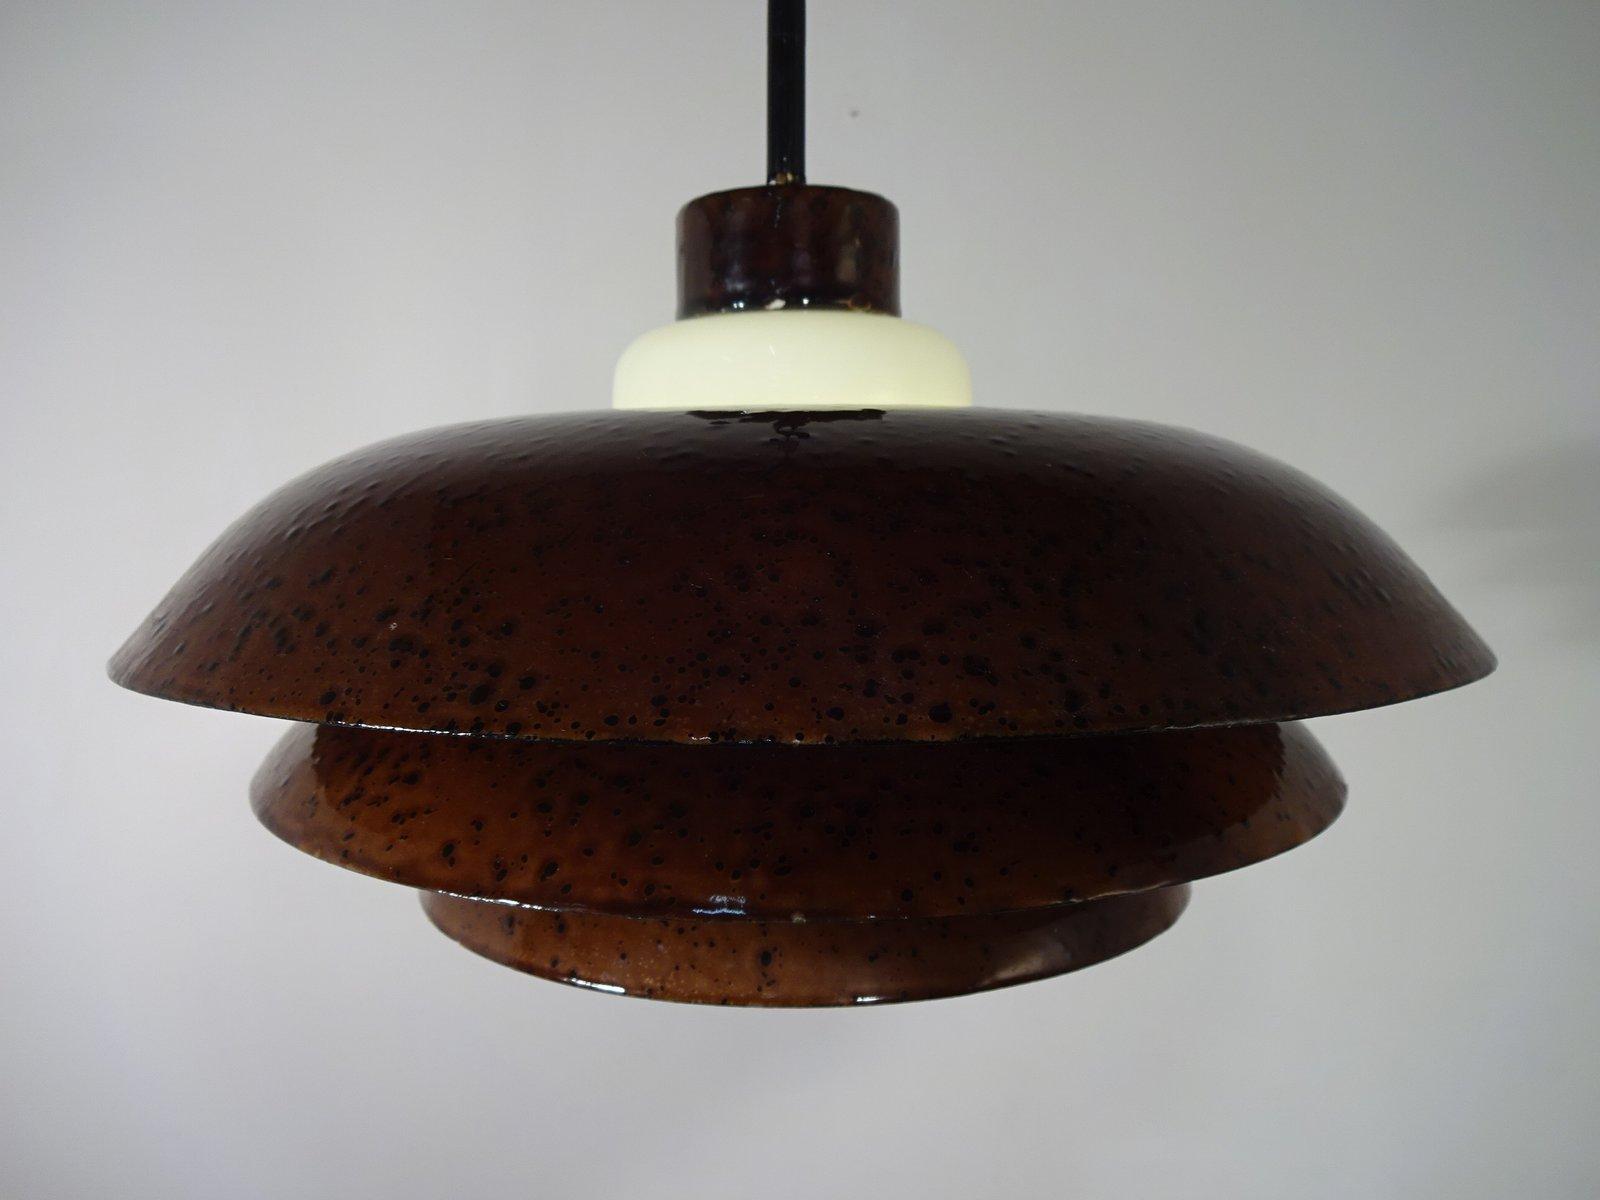 Kupfer emaillierte lampen 1940er 2er set bei pamono kaufen for Lampen niederlande